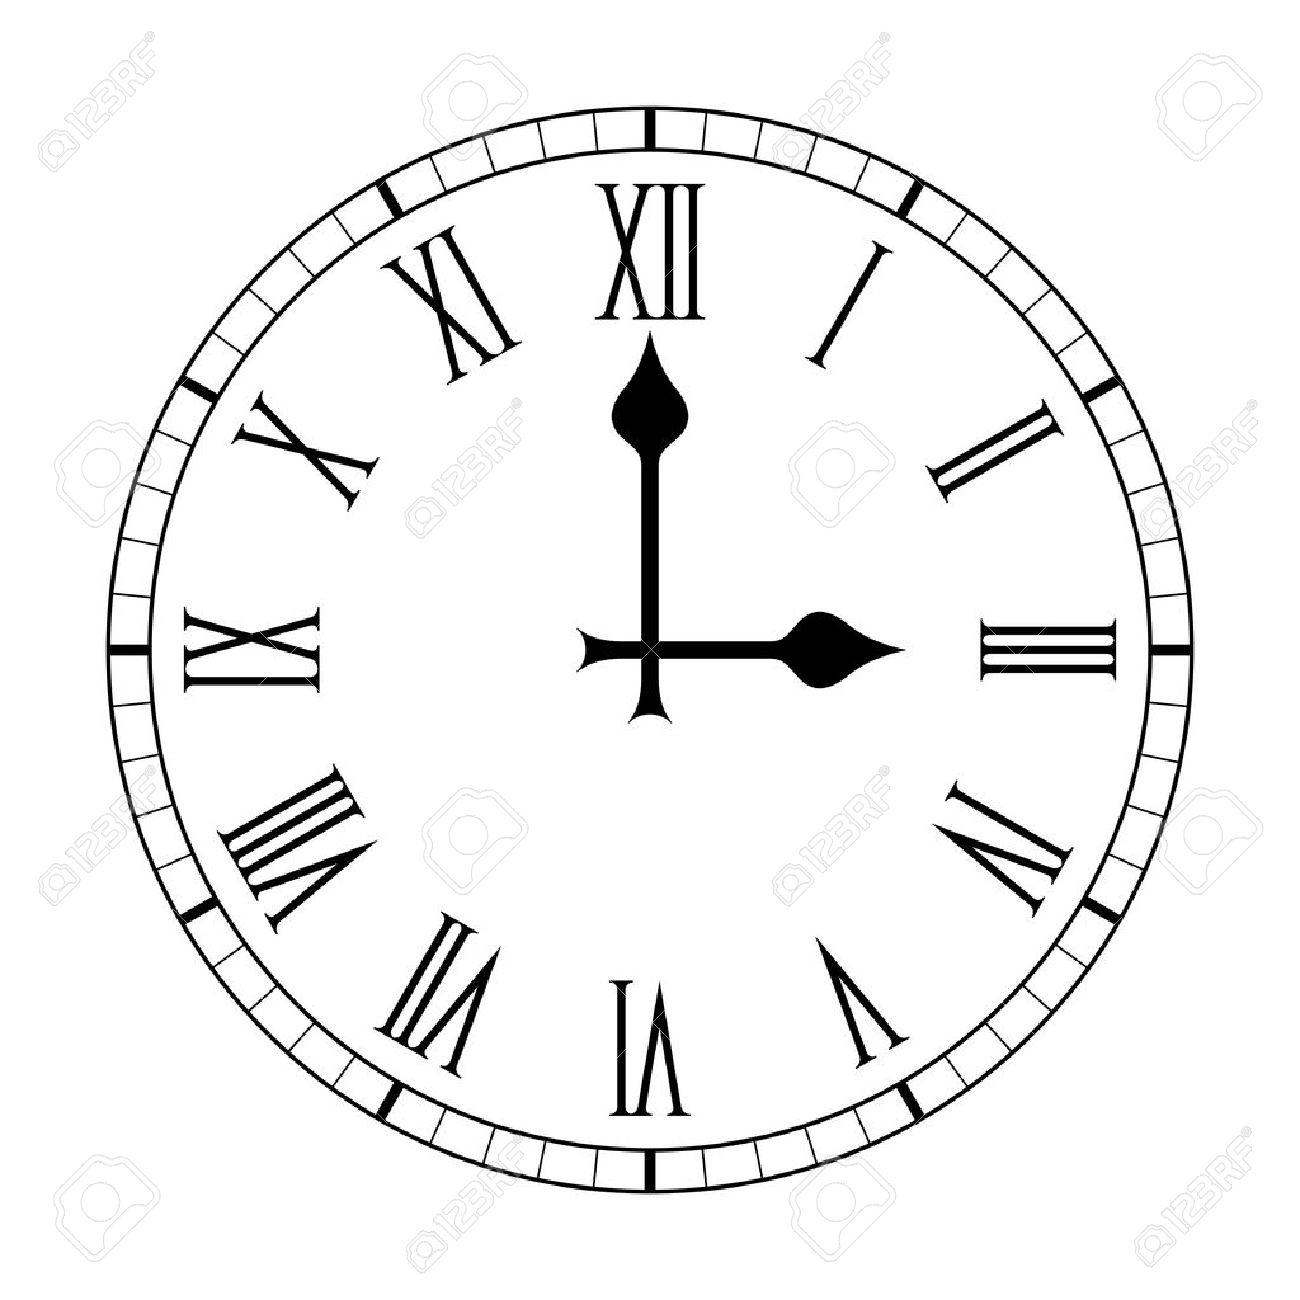 plain roman numeral clock face royalty free cliparts vectors and